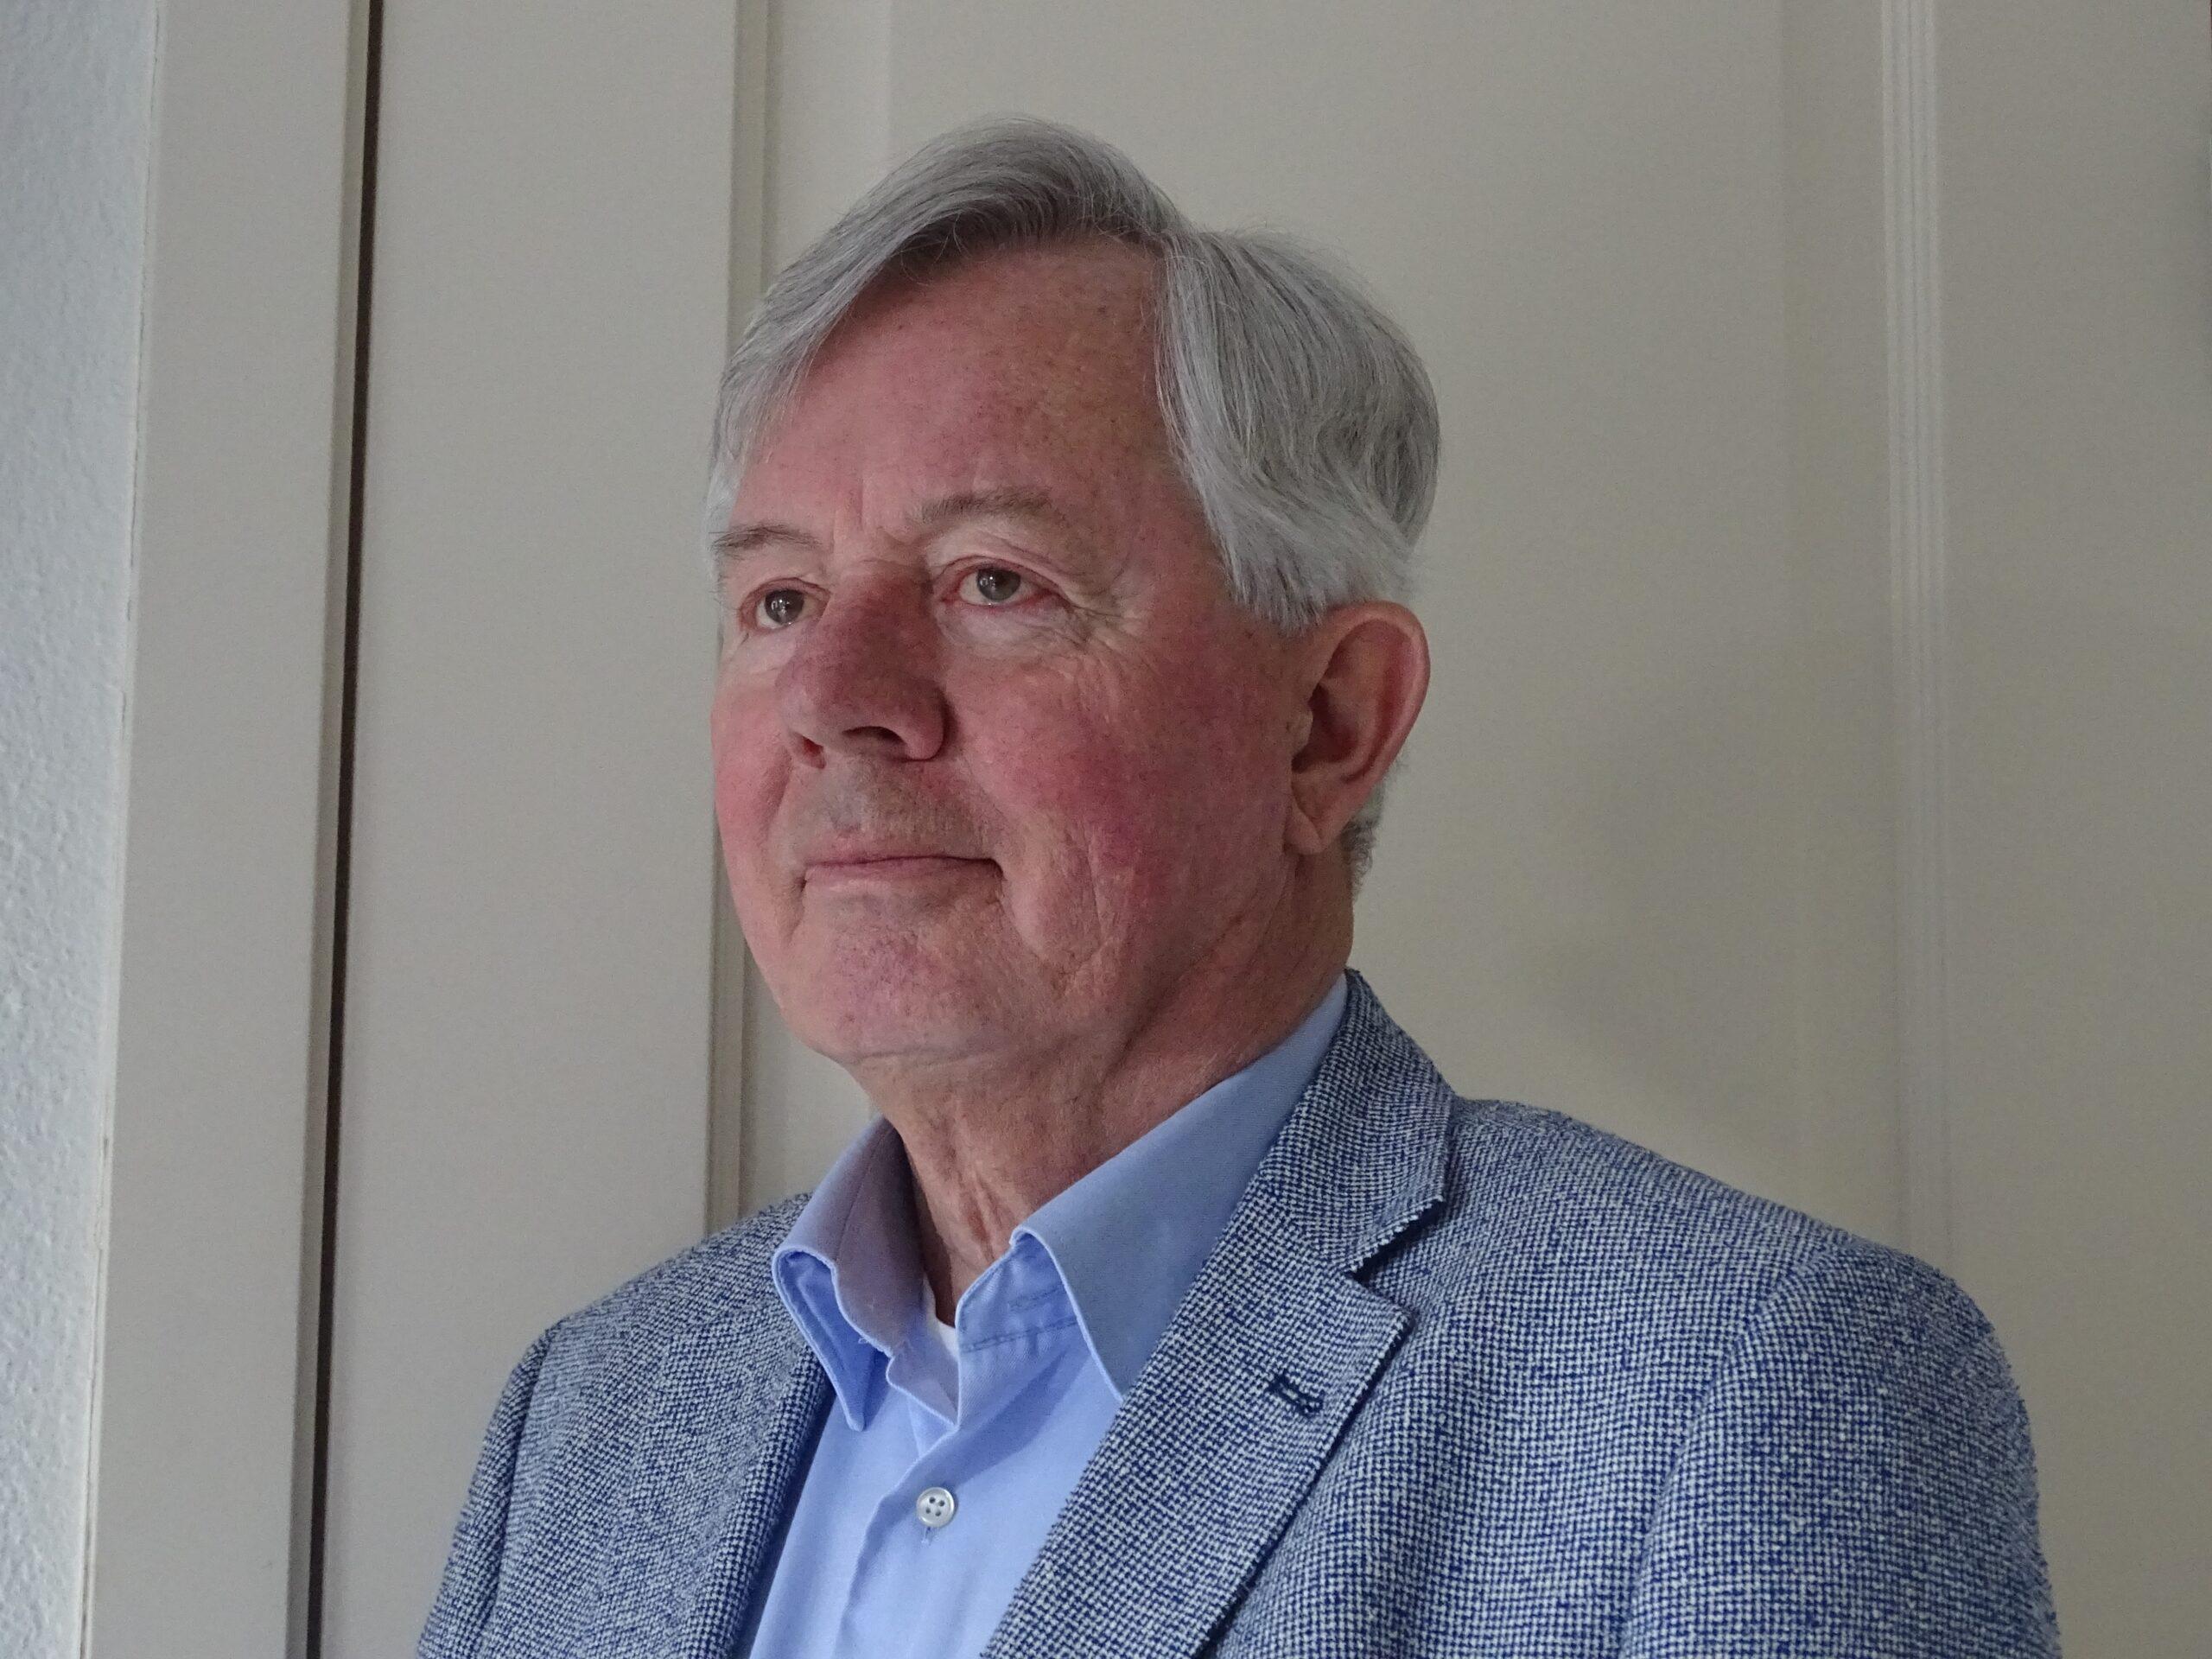 Piet Pijper